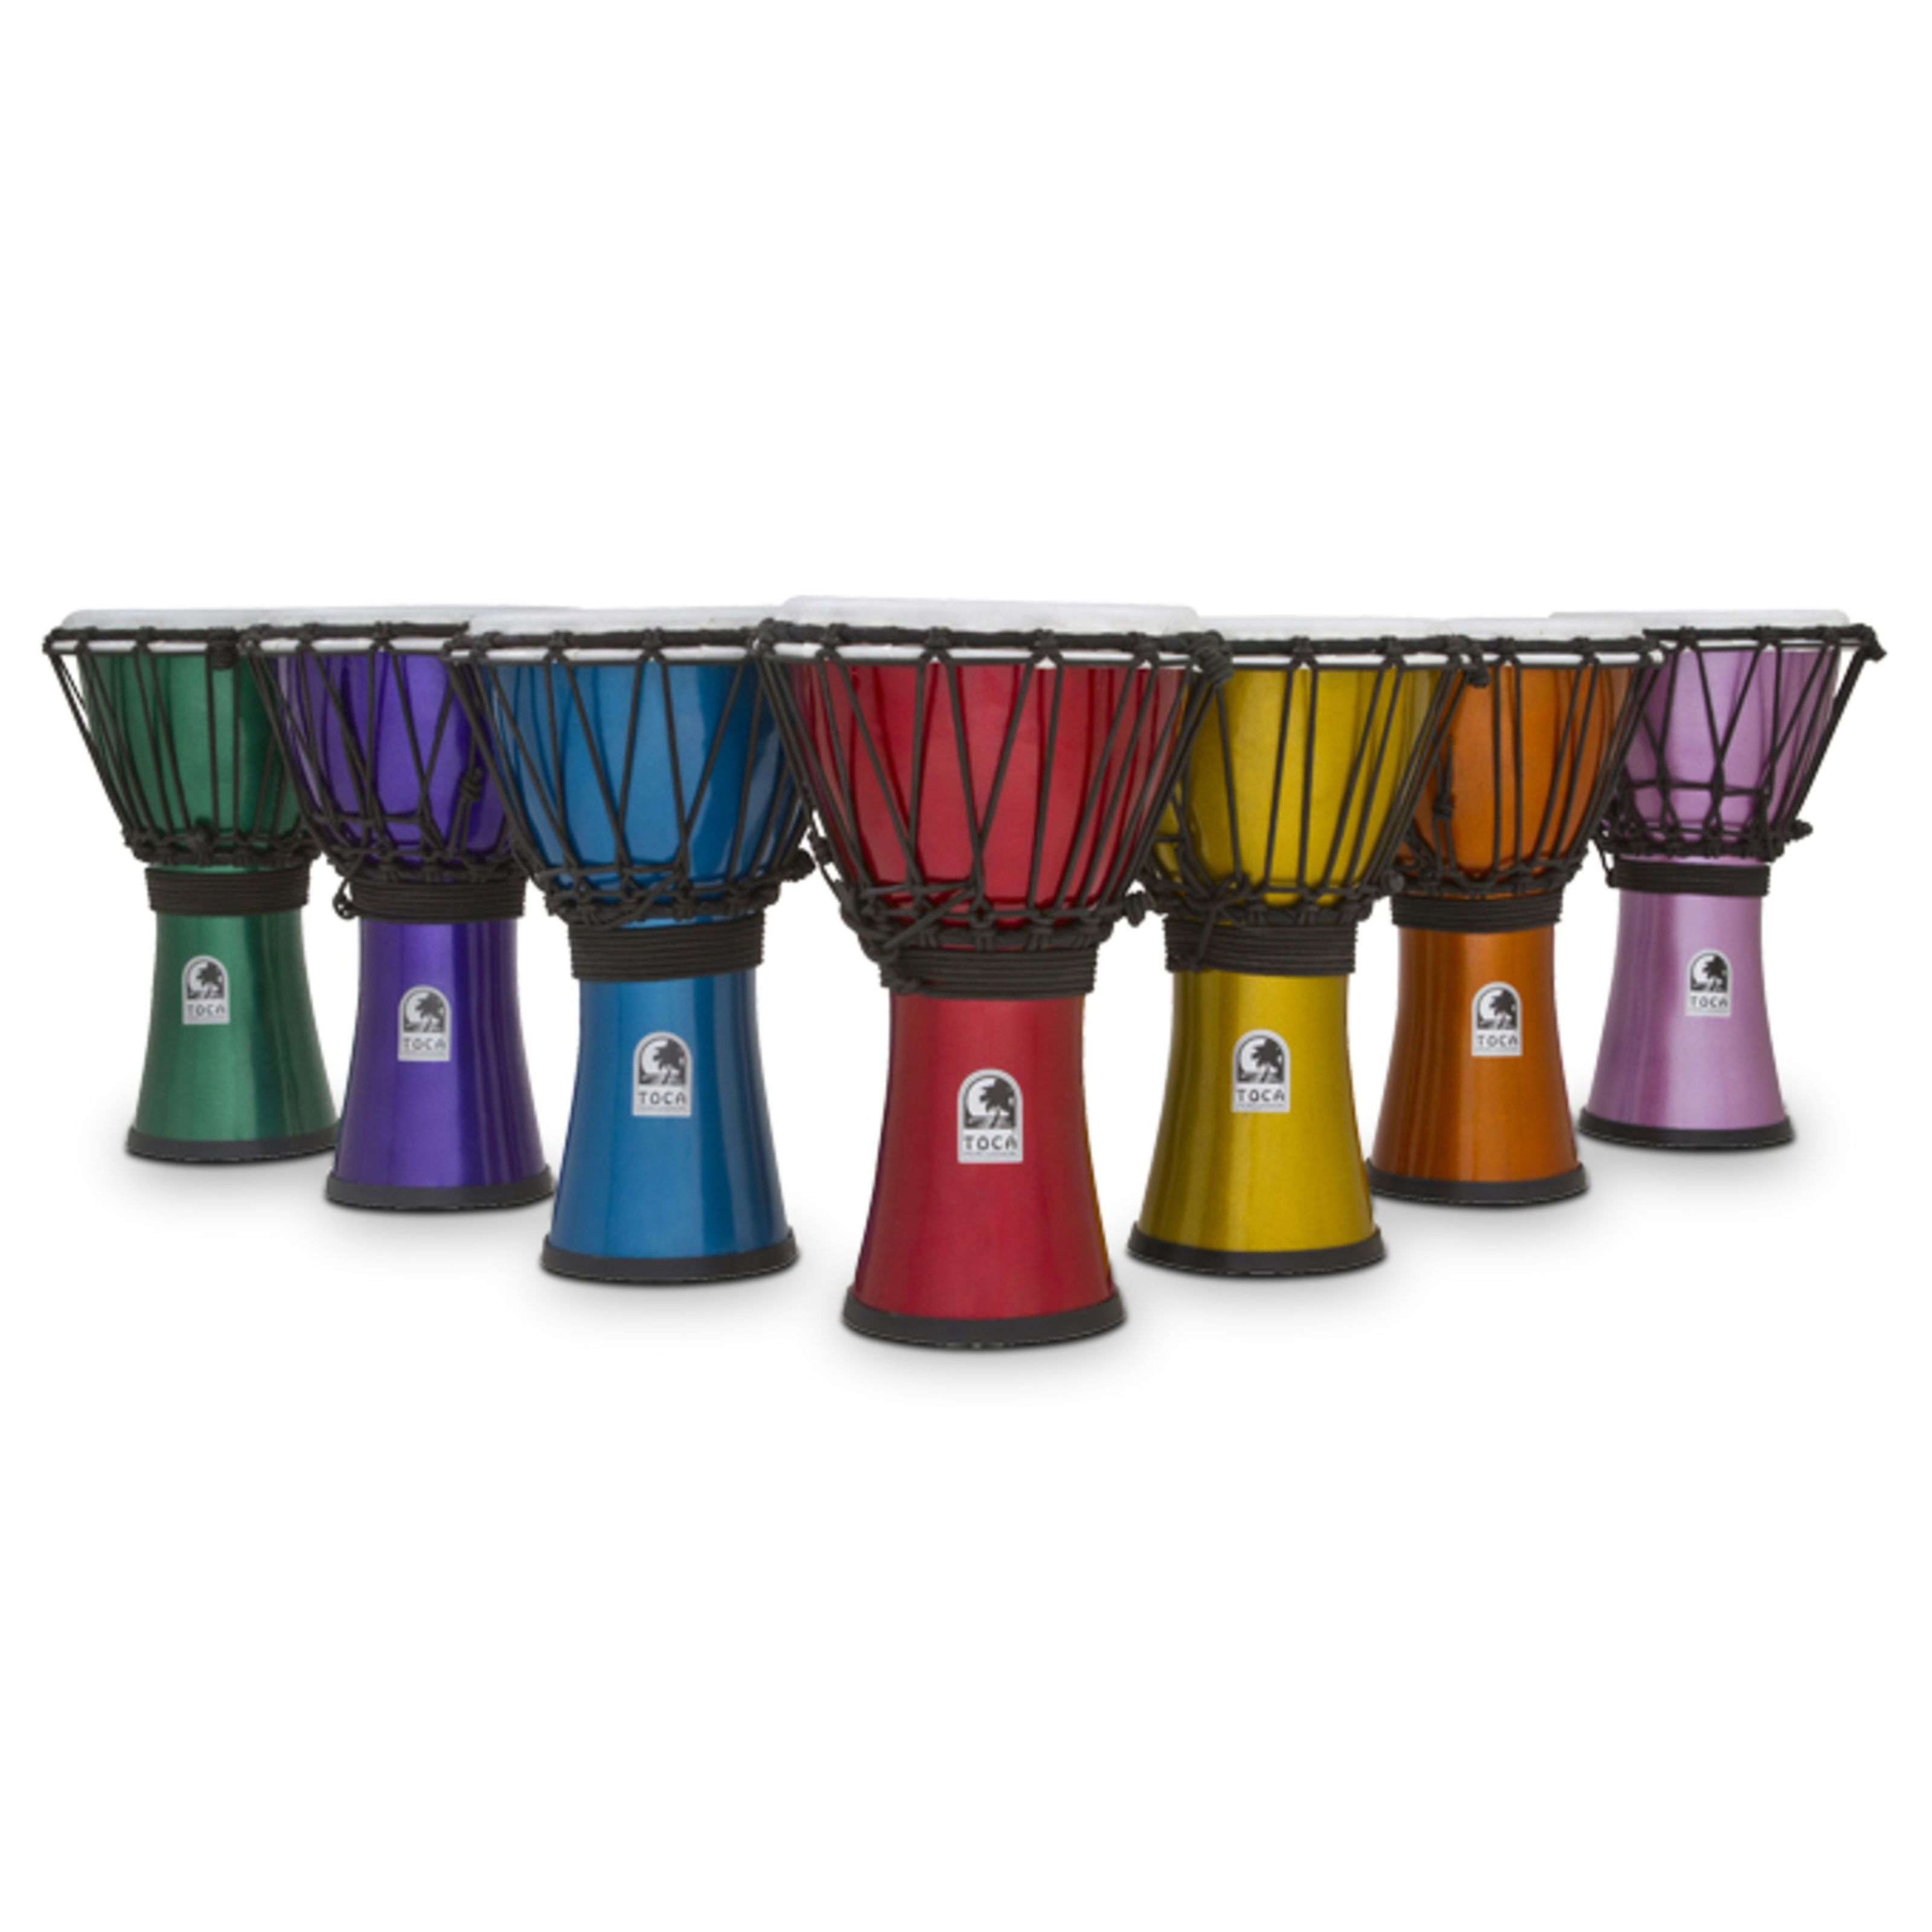 Toca Percussion - ColorSound Djembe TFCDJ-7MS, Djembe-Set, 7 Stück, 7 Farben